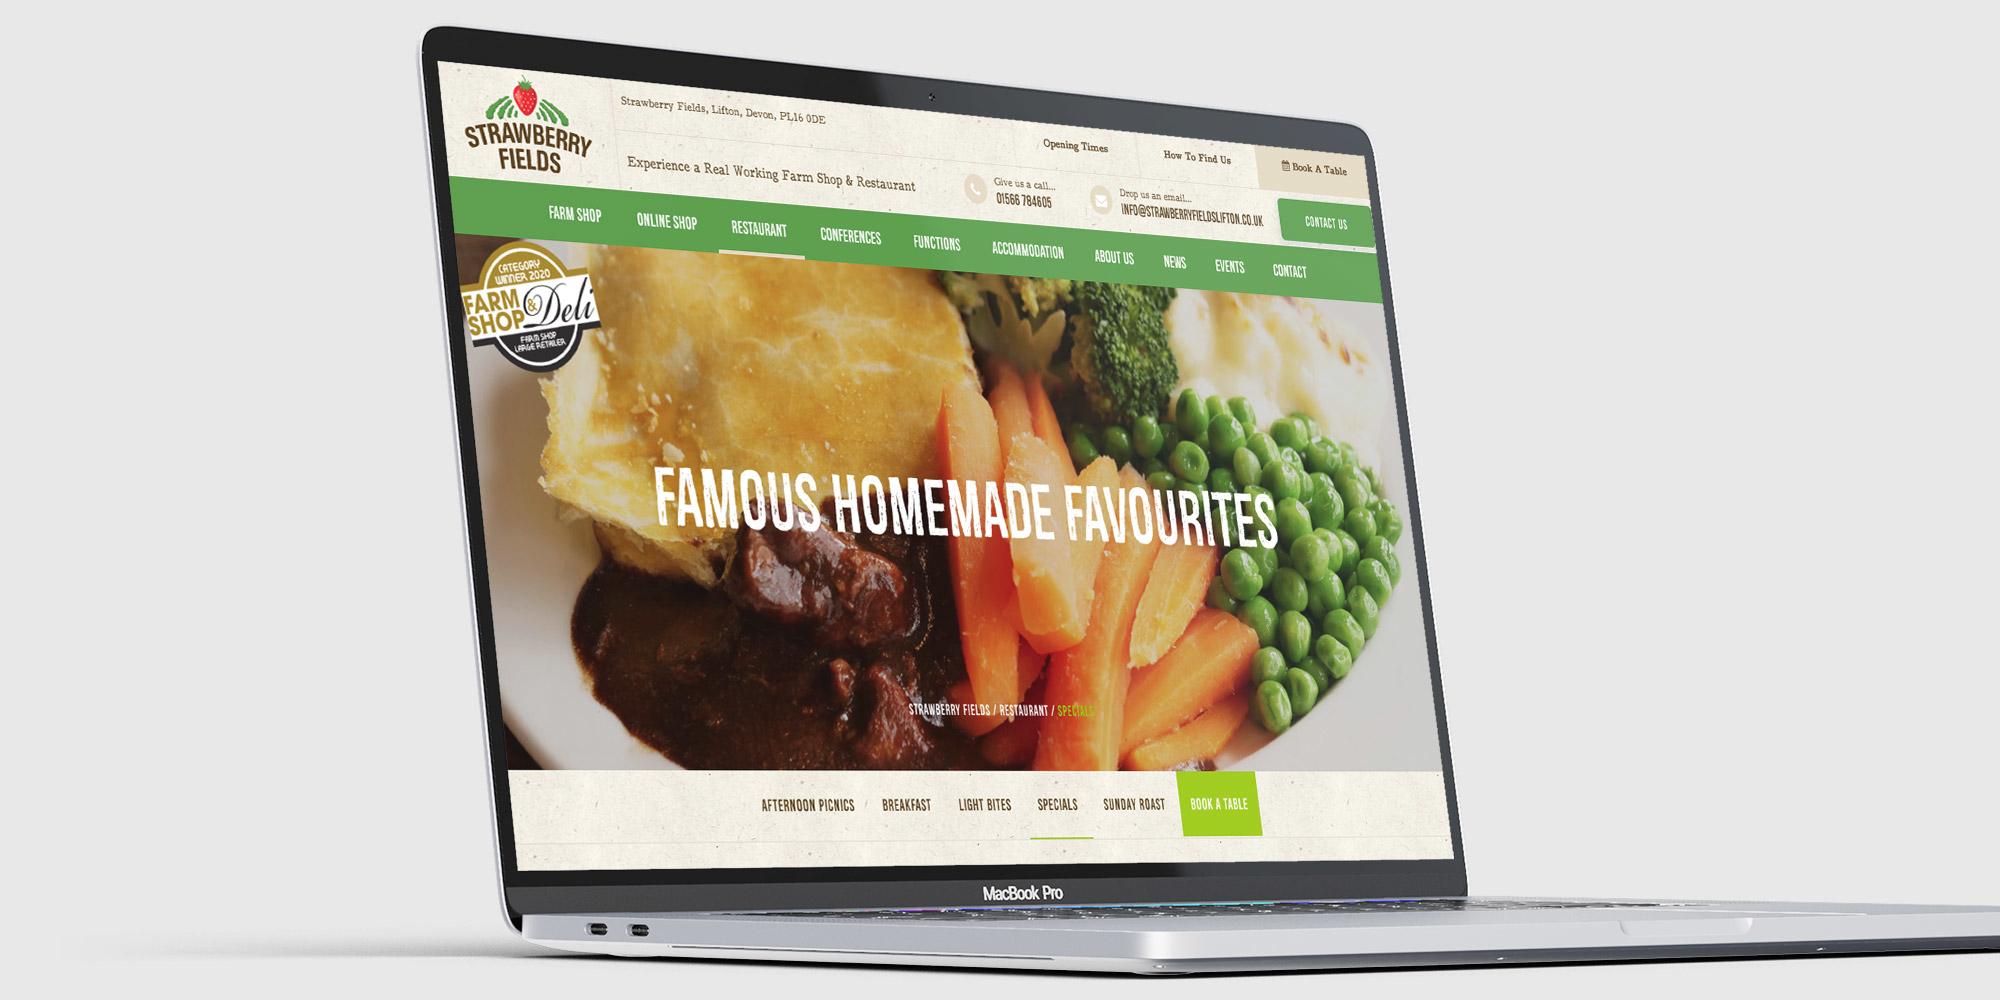 Strawberry Fields Wordpress Website Design on Laptop